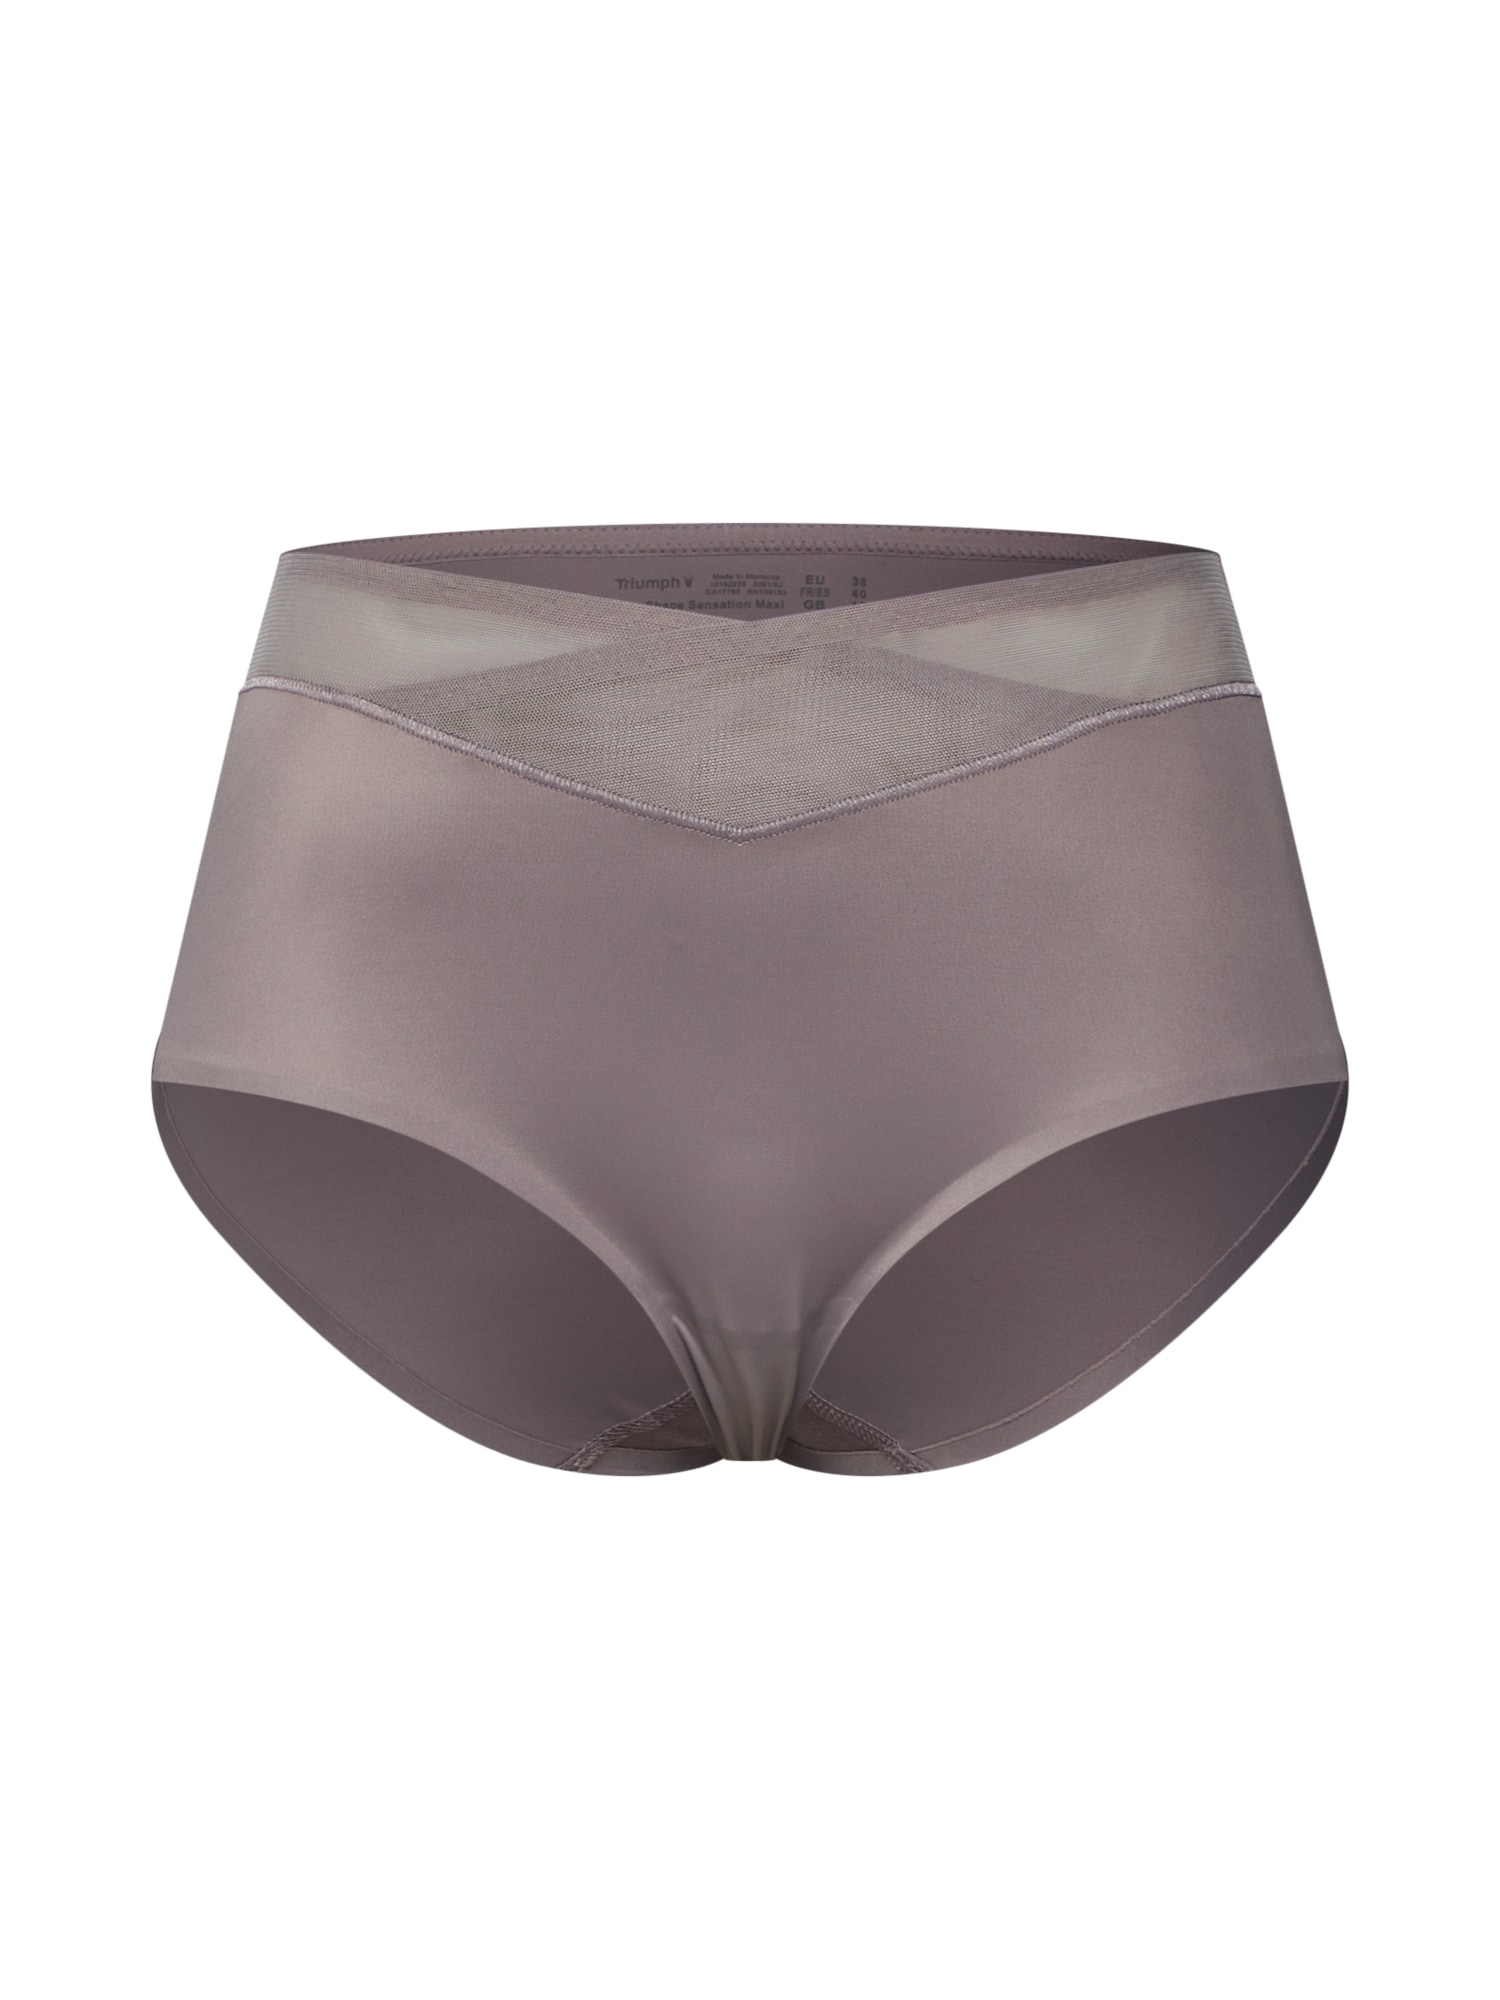 Stahovací prádlo True Shape Sensation Maxi barvy bláta TRIUMPH